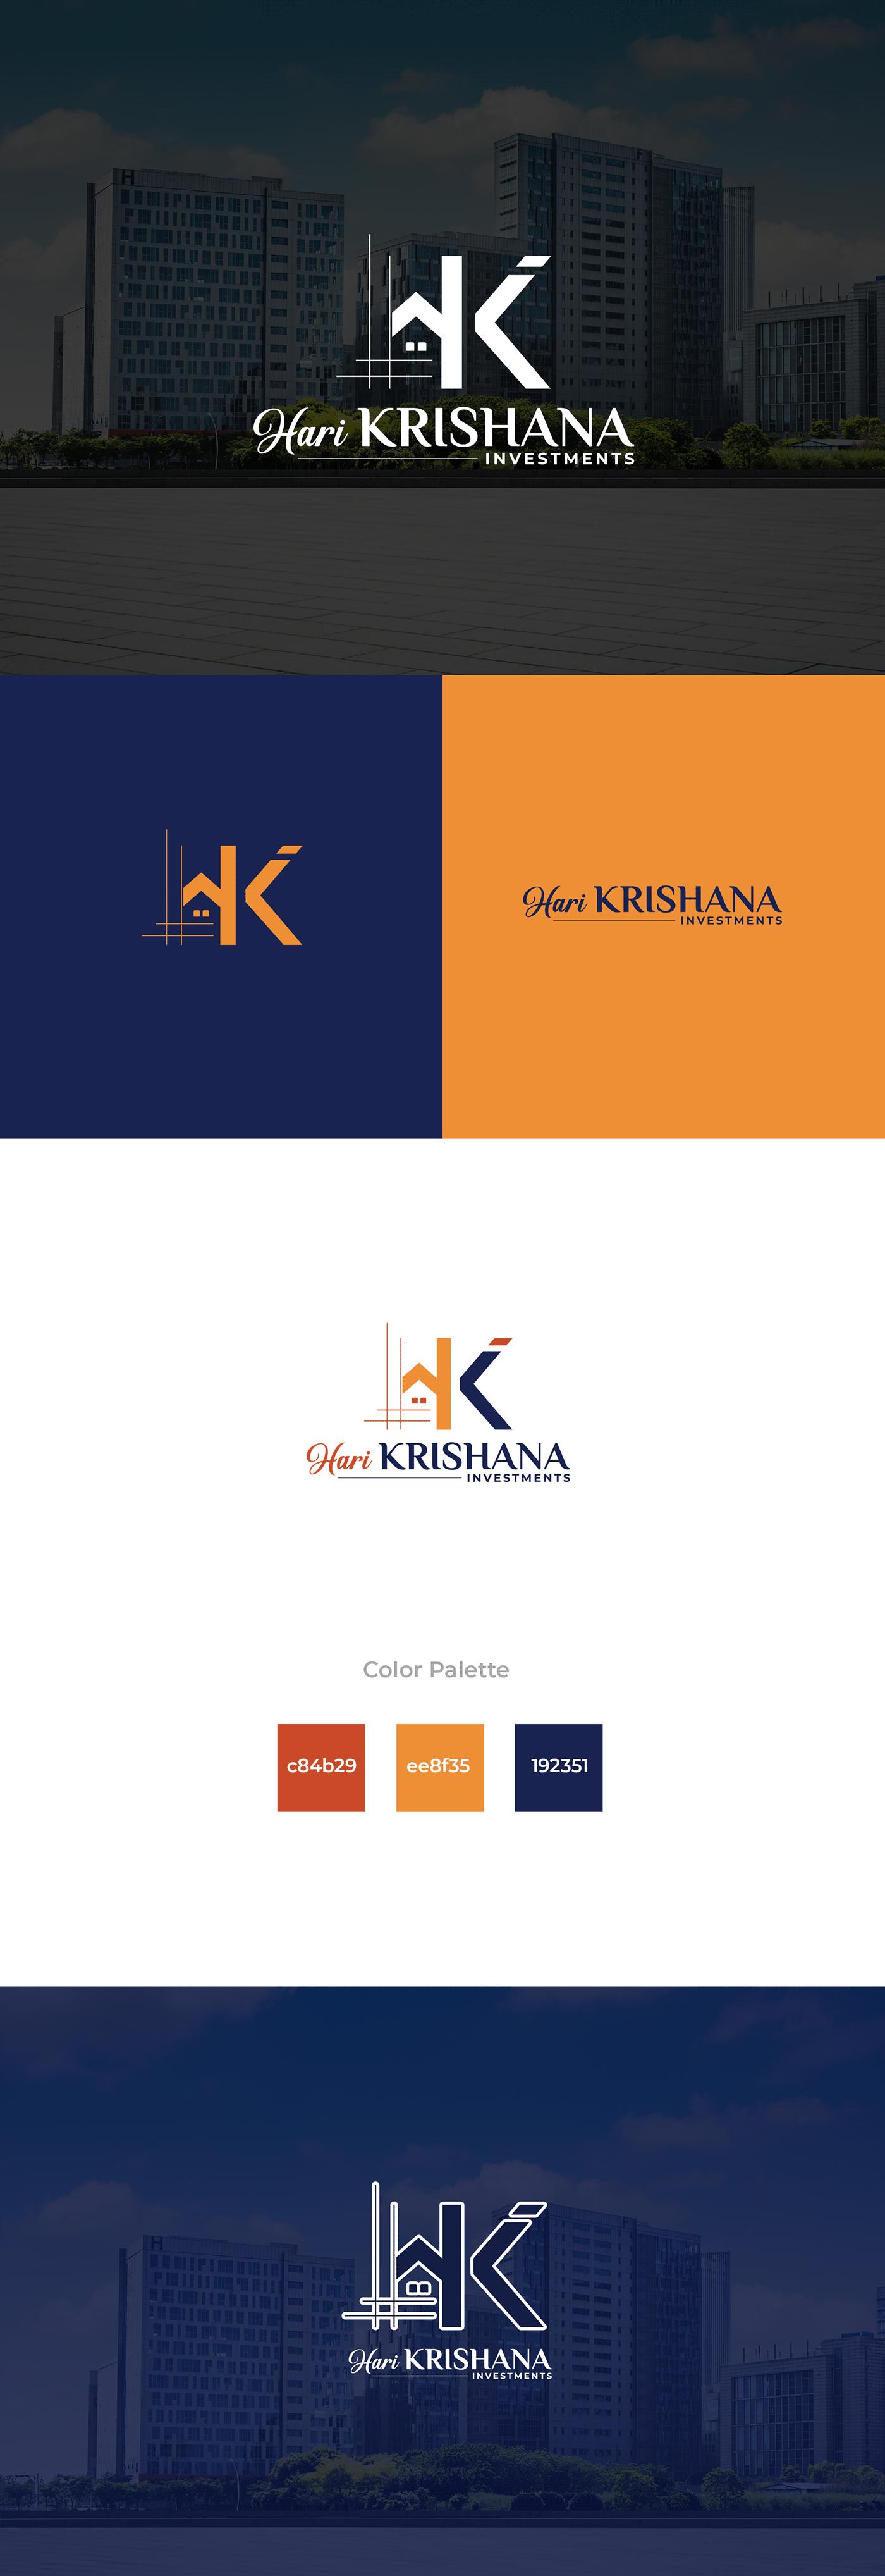 agency graphicdesign logodesign